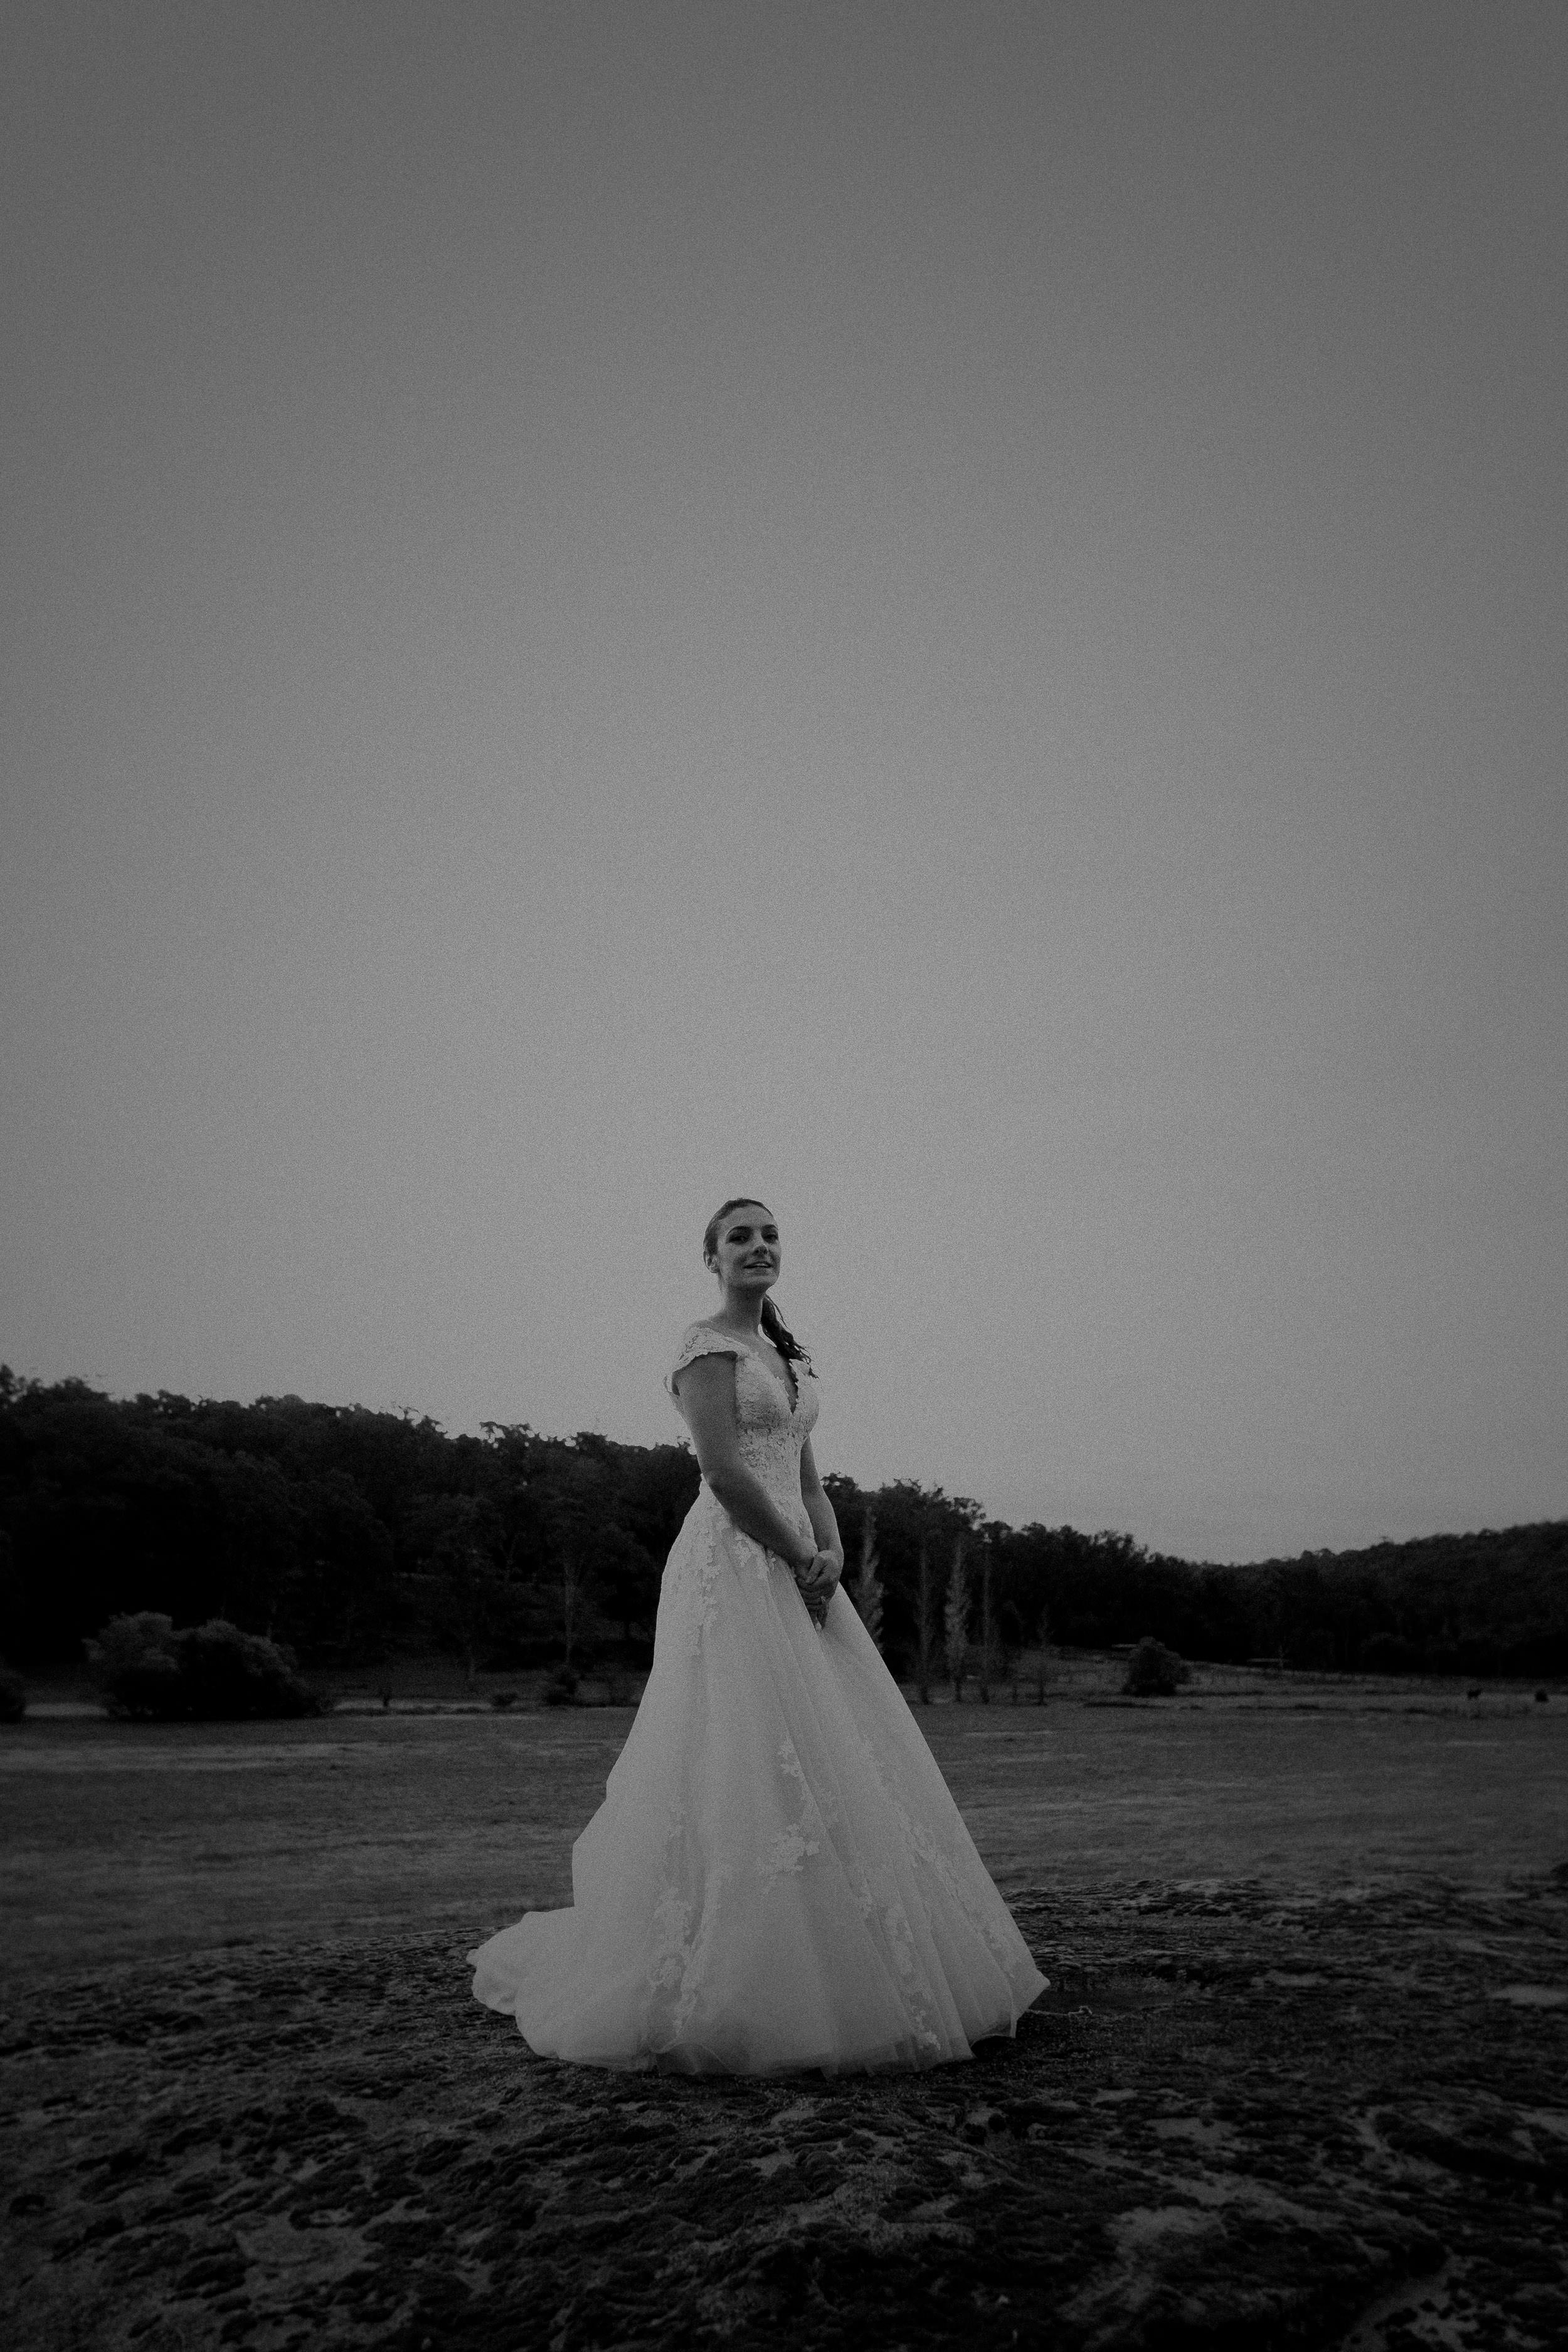 g_c wedding - kings _ thieves elopement wedding photography - blog 94.jpg